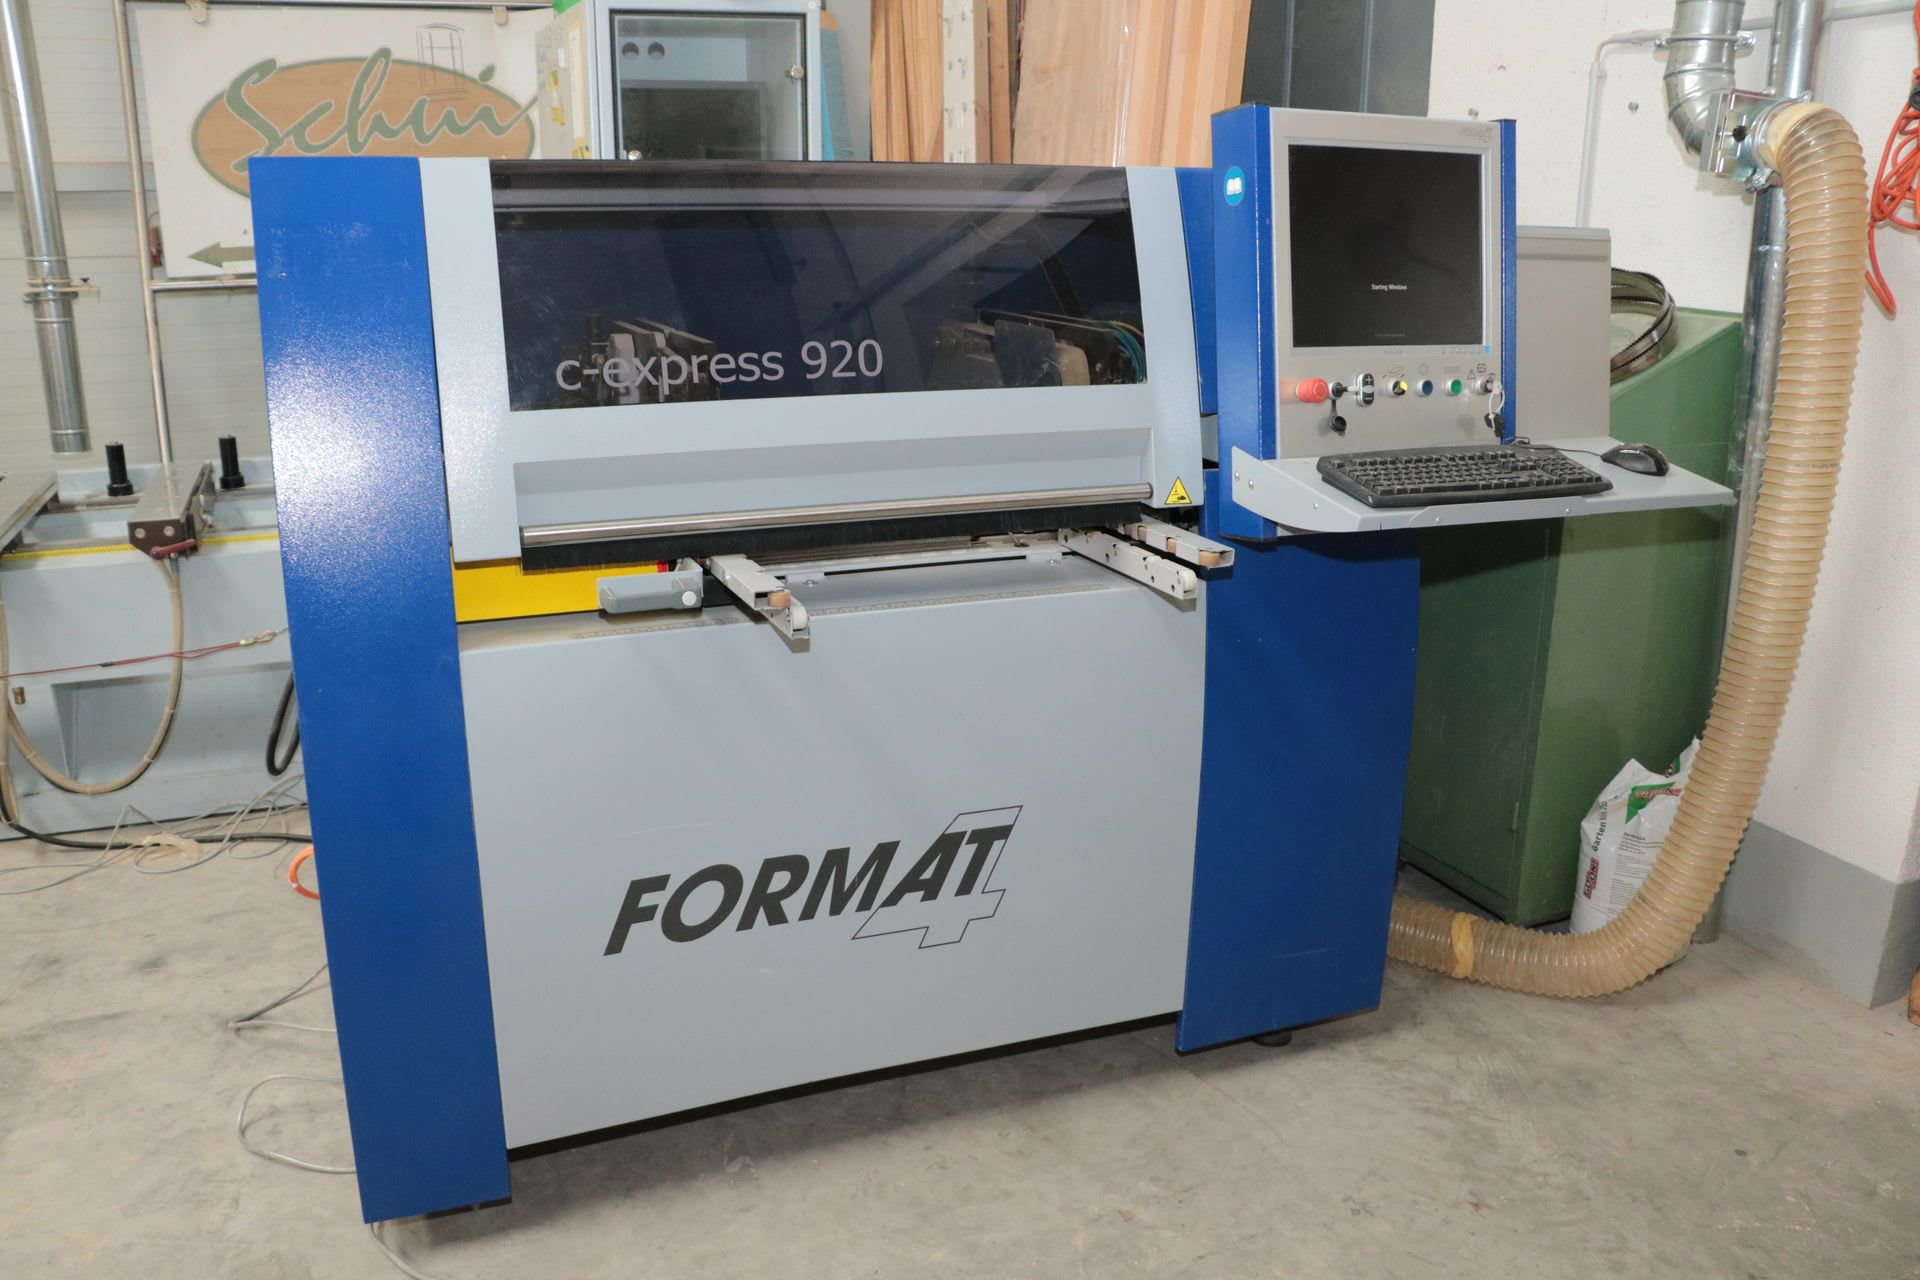 FORMAT 4 c-express 920 CNC-Bearbeitungszentrum